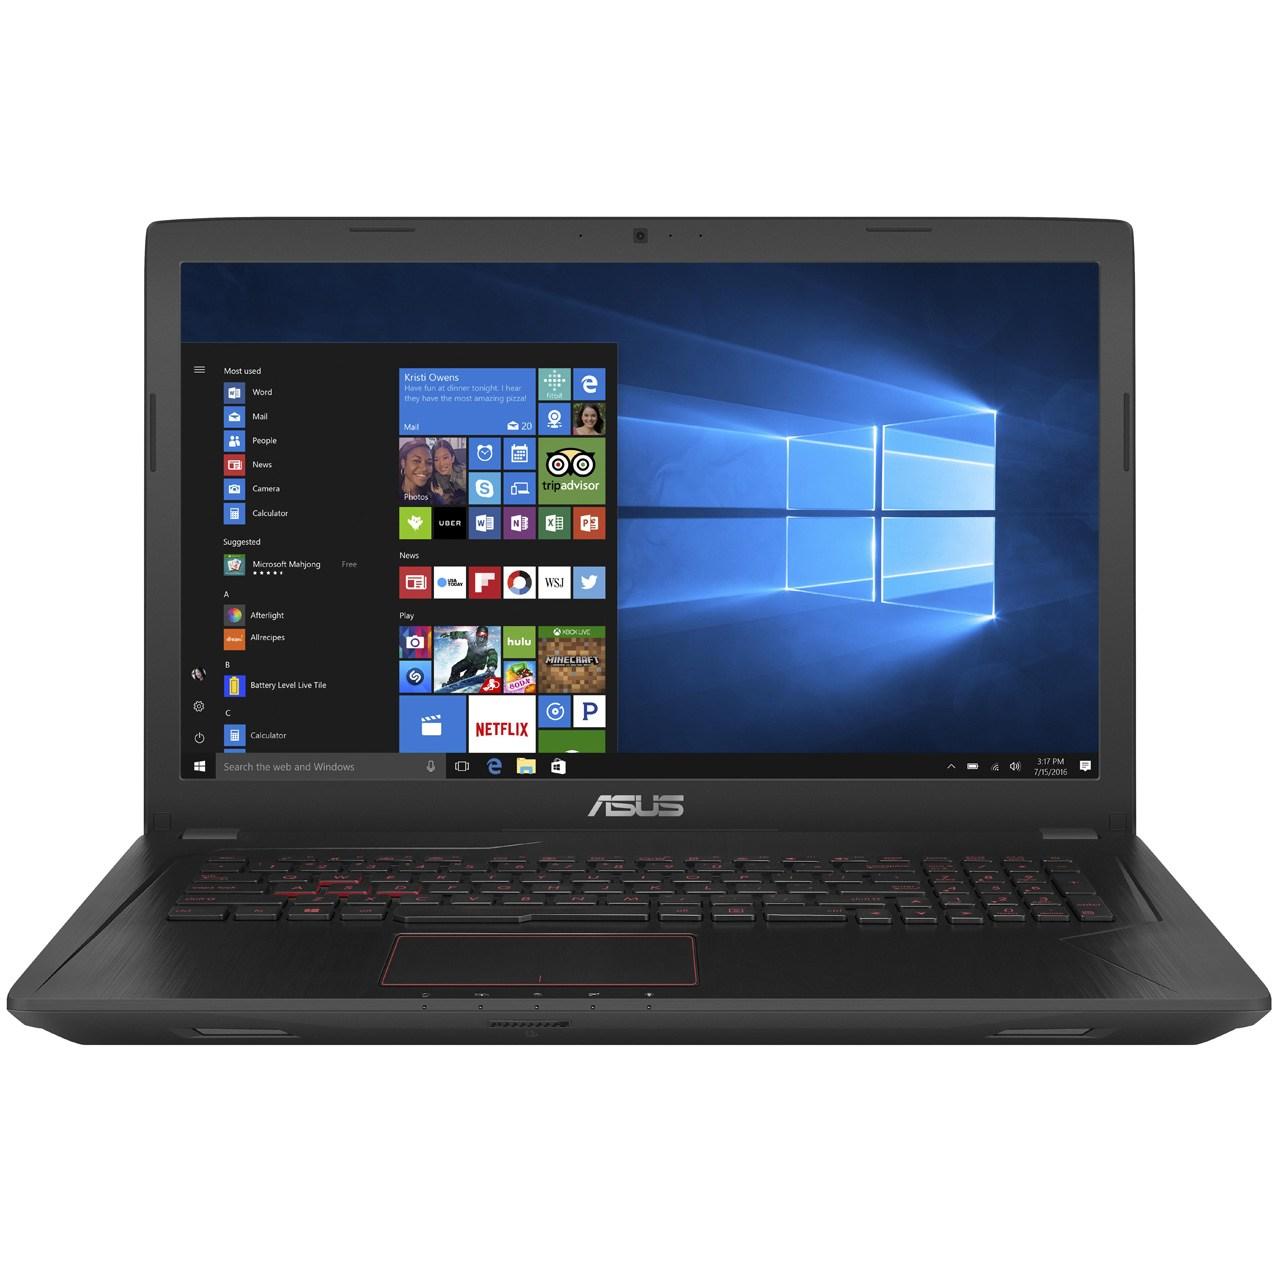 لپ تاپ 17 اینچی ایسوس مدل ASUS FX753VD - B